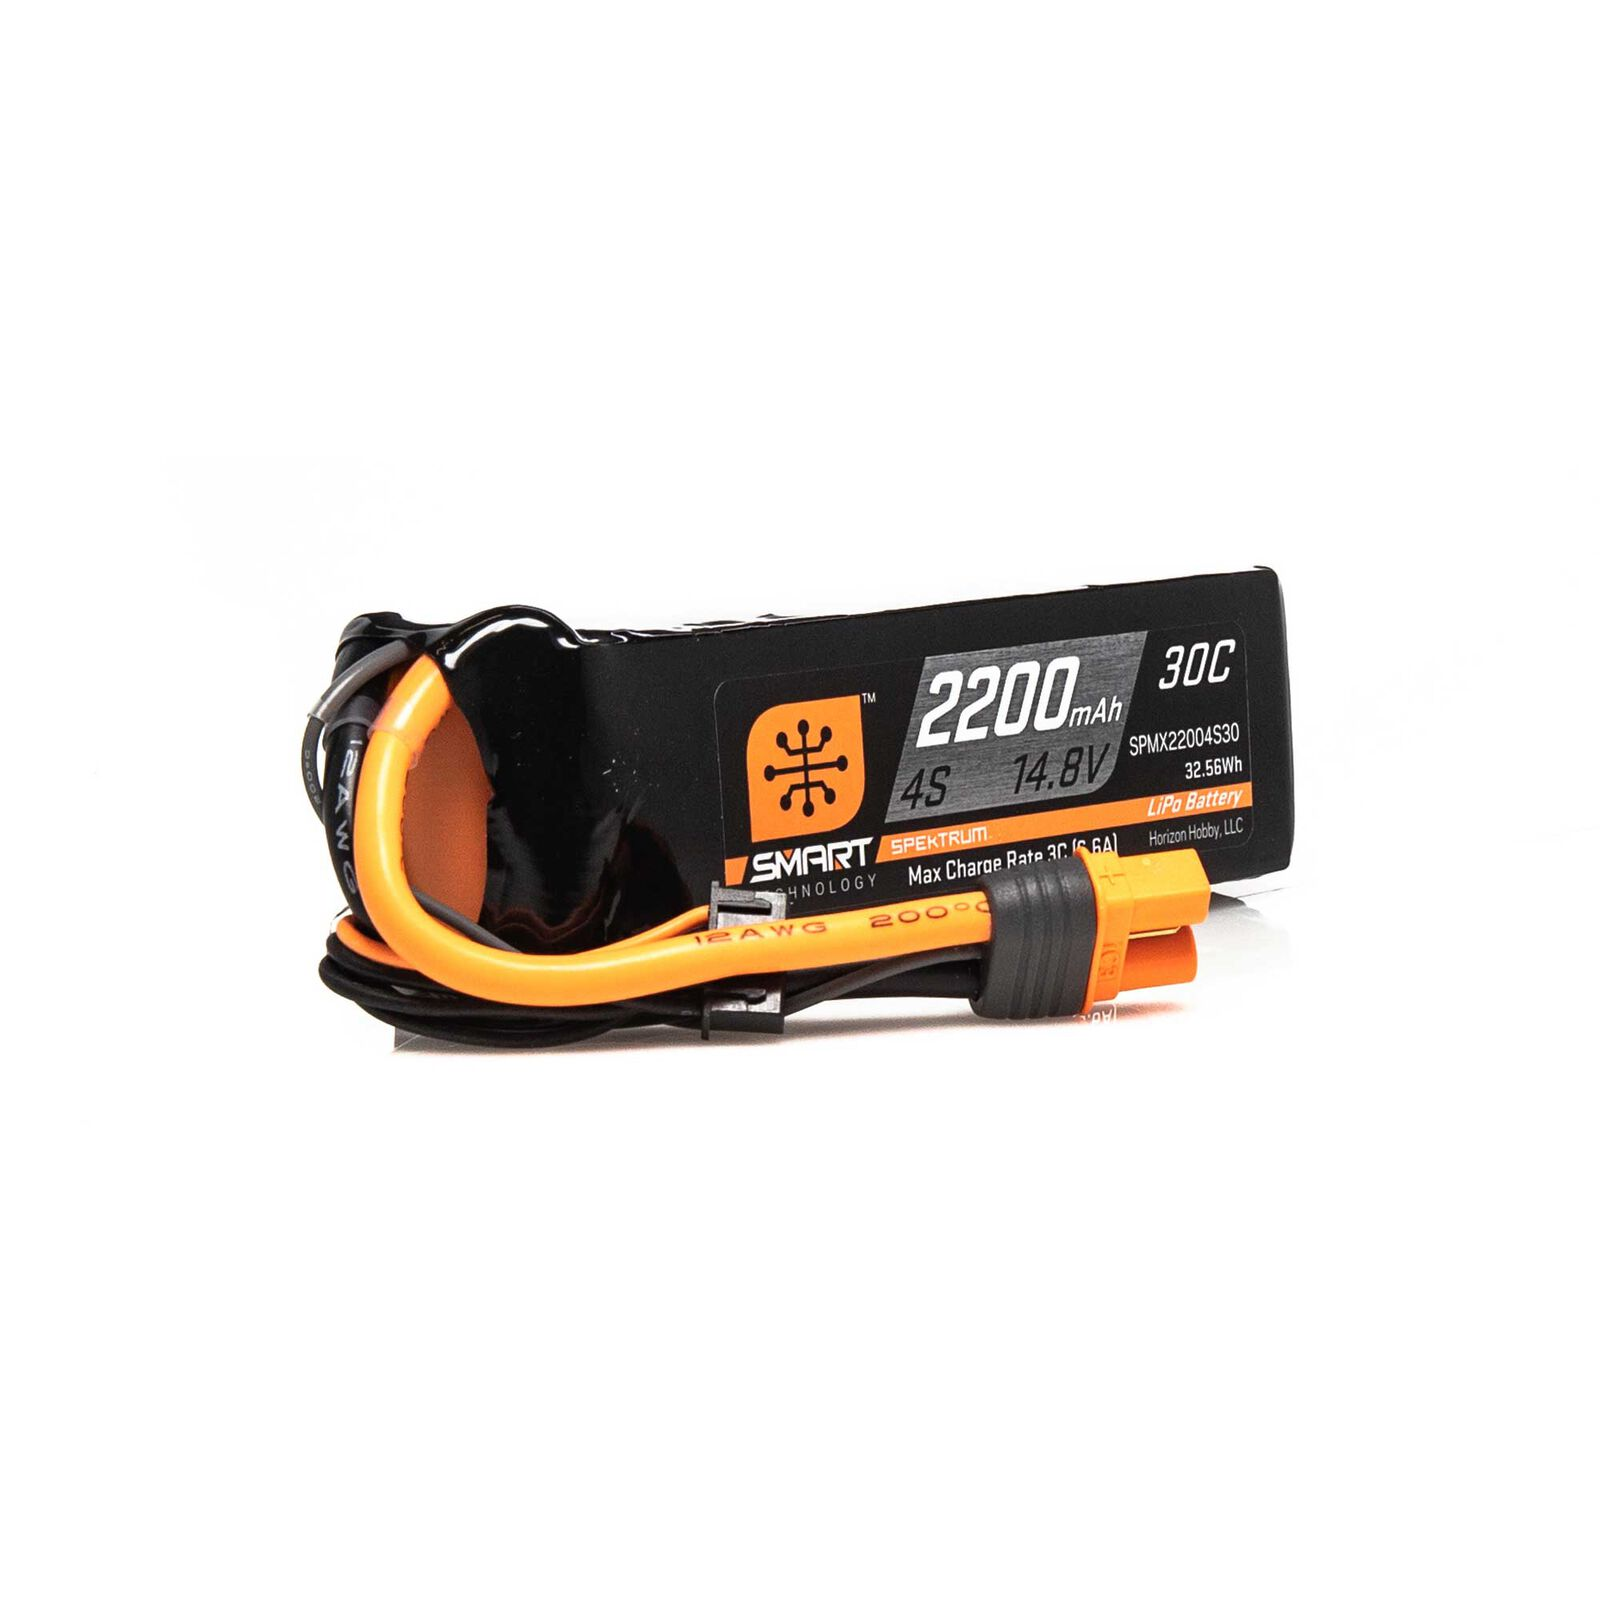 14.8V 2200mAh 4S 30C Smart LiPo Battery: IC3